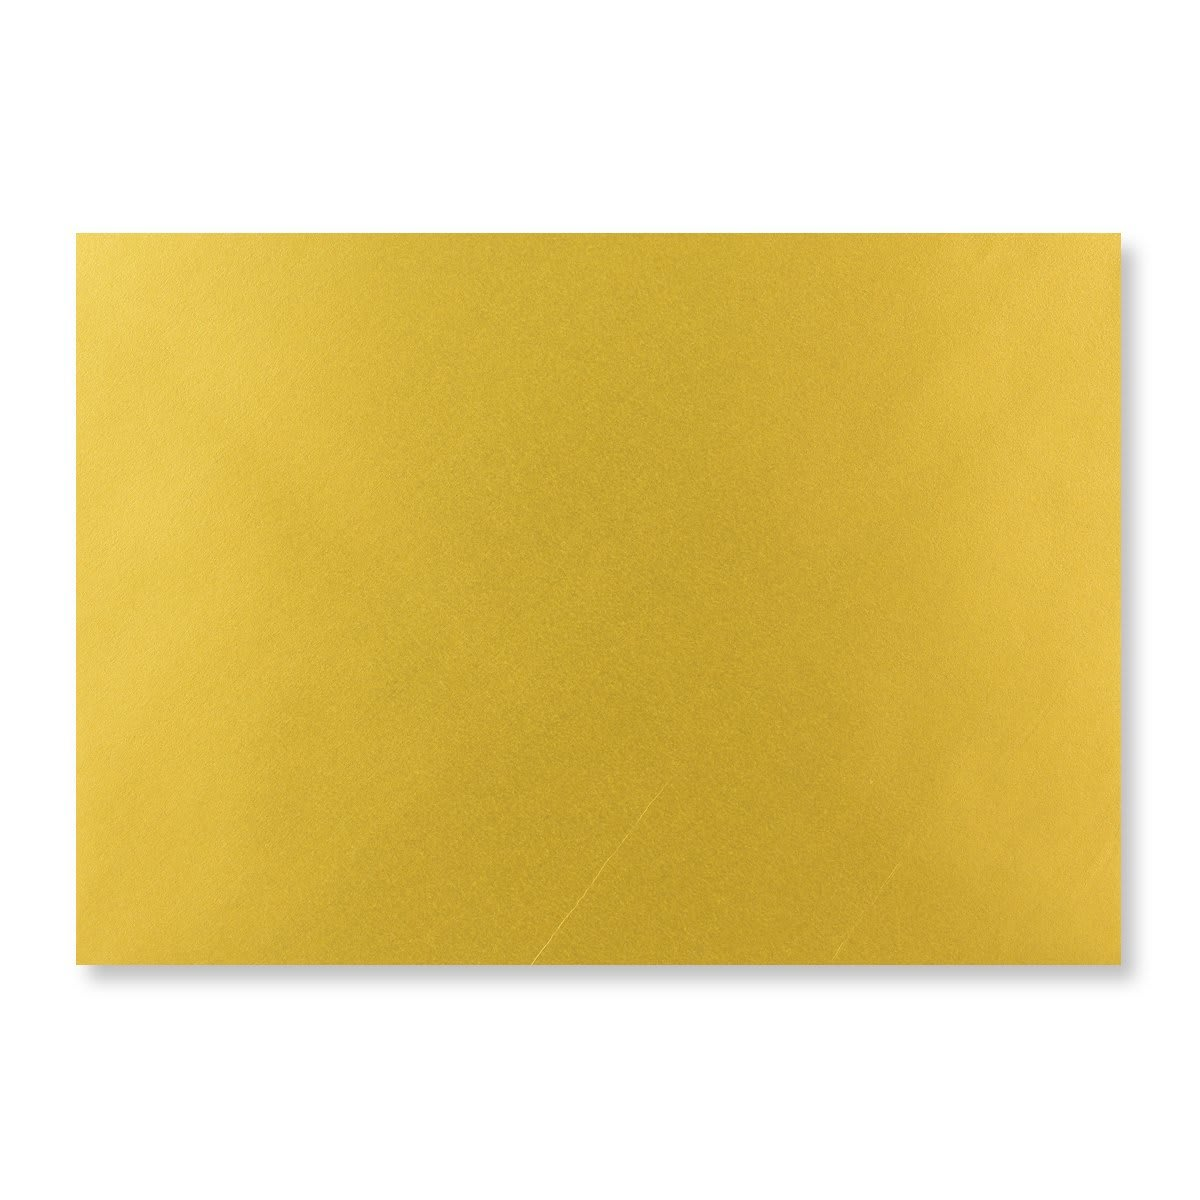 C5 METALLIC GOLD ENVELOPES (NEW SHADE)